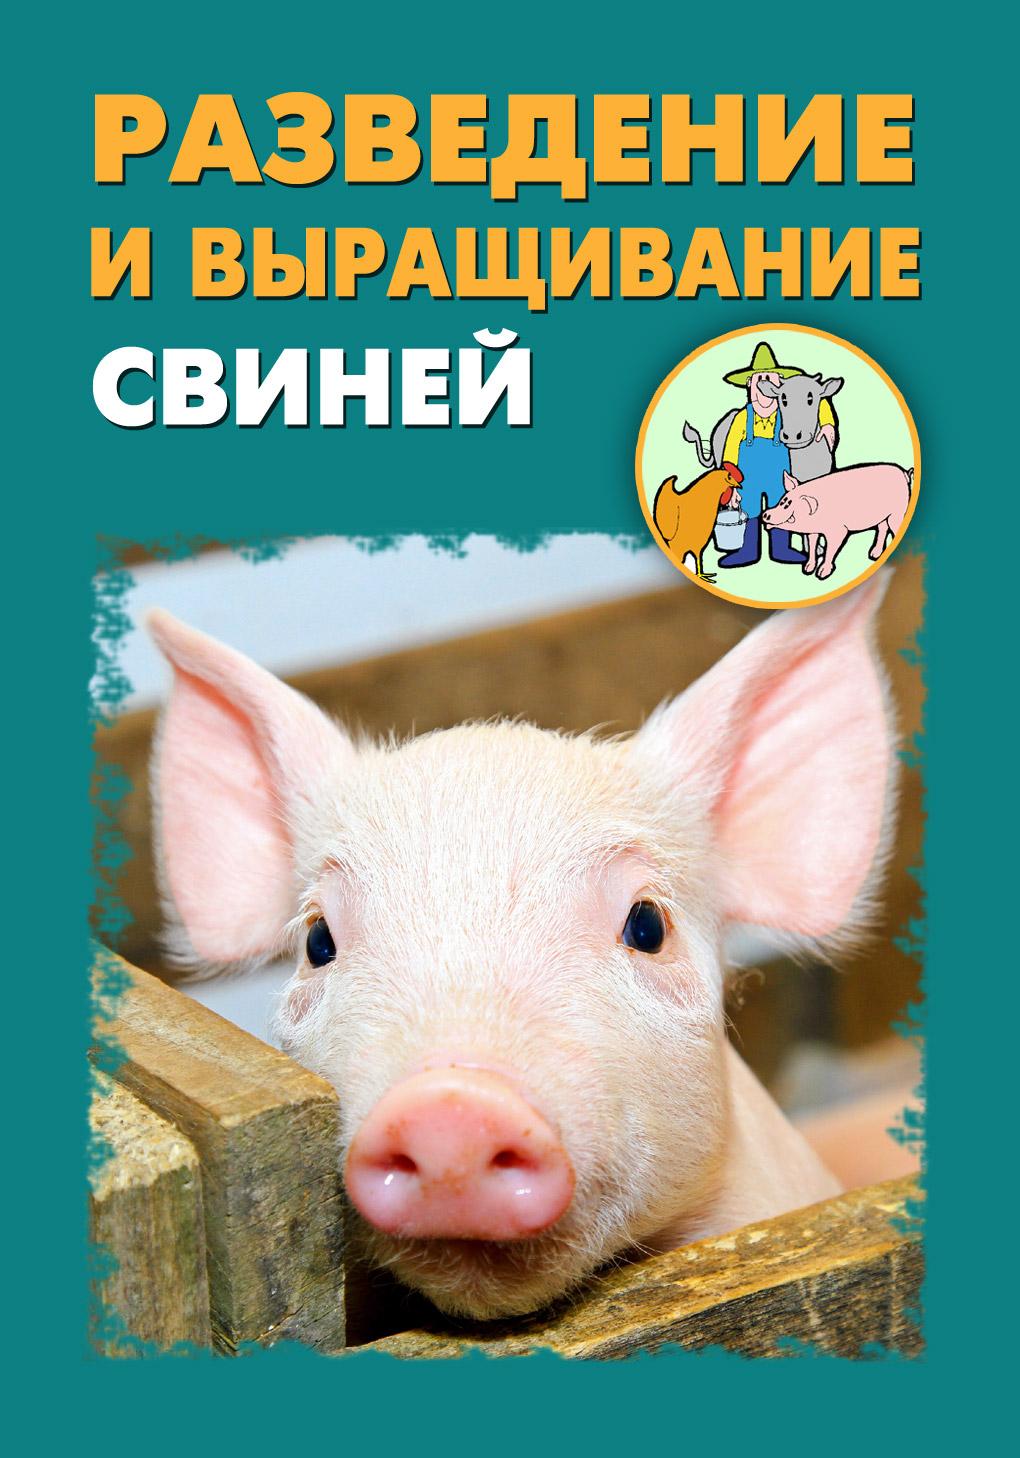 Книга Разведение и выращивание свиней